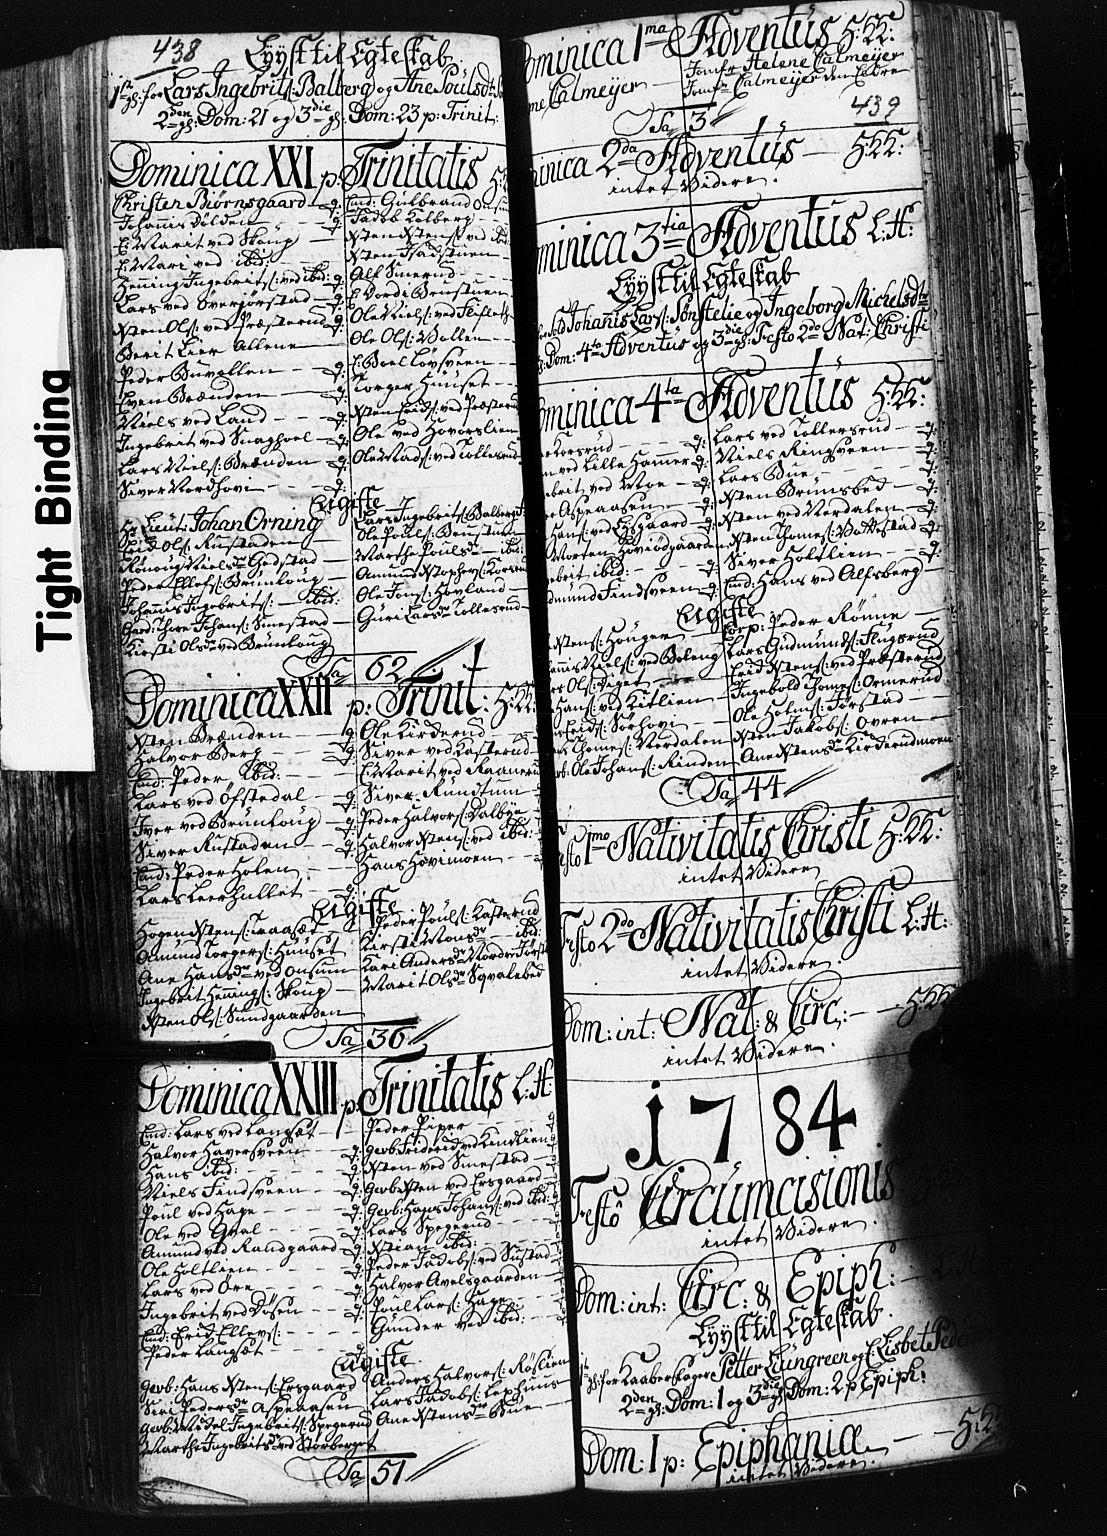 SAH, Fåberg prestekontor, Klokkerbok nr. 3, 1768-1796, s. 438-439